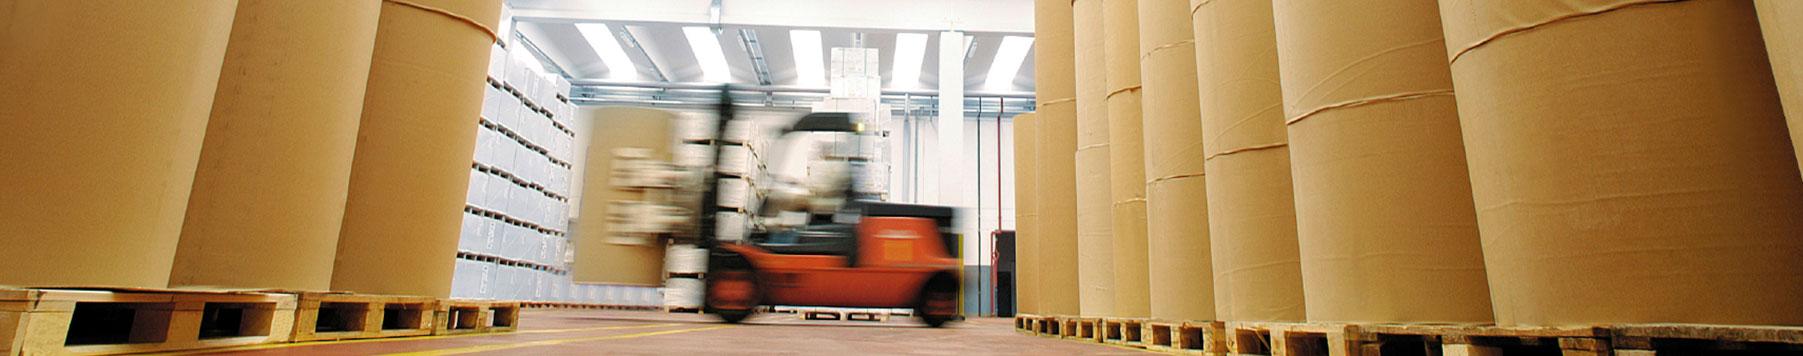 manufacturing-logistics-banner.jpg